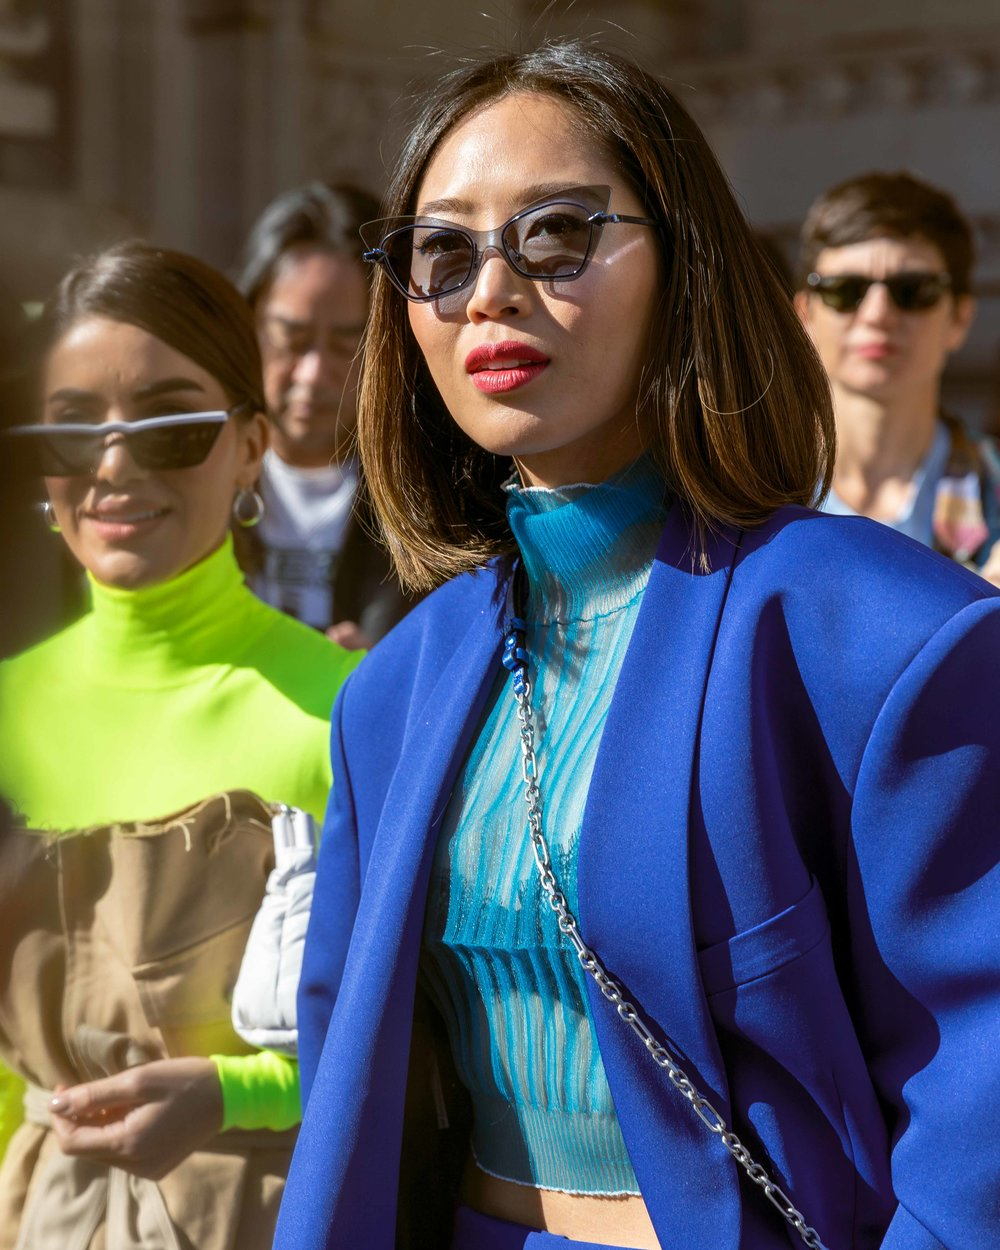 Paris-Fashion-Week-Spring-2019-September-2018_by_Alexis_Breugelmans_003.jpg